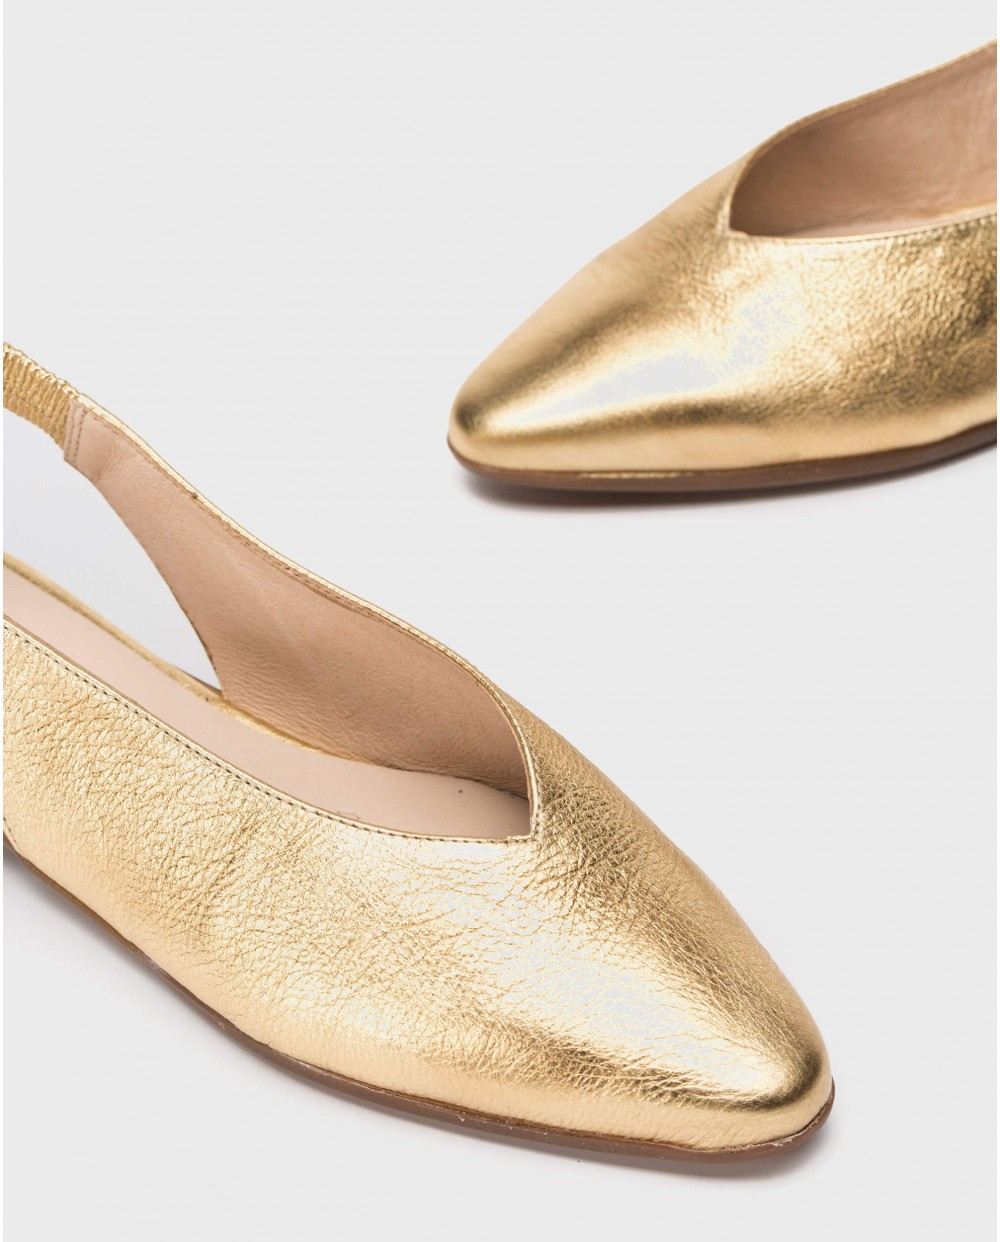 Wonders-Flat Shoes-Metallic leather slingback sandal